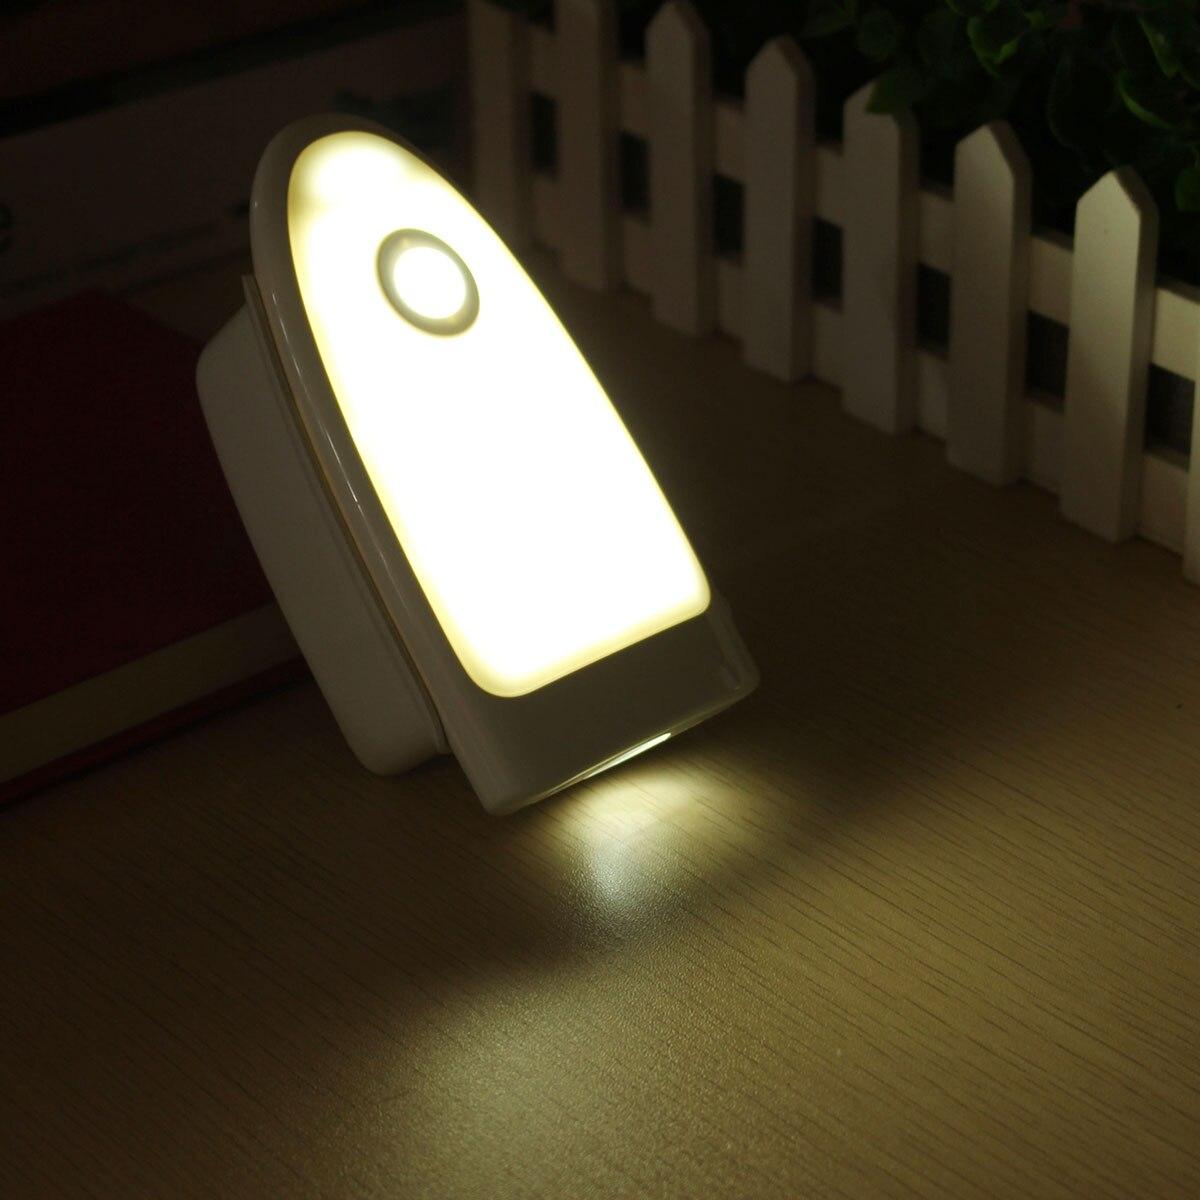 Night Lamp For Bedroom Online Get Cheap Uk Night Light Aliexpresscom Alibaba Group